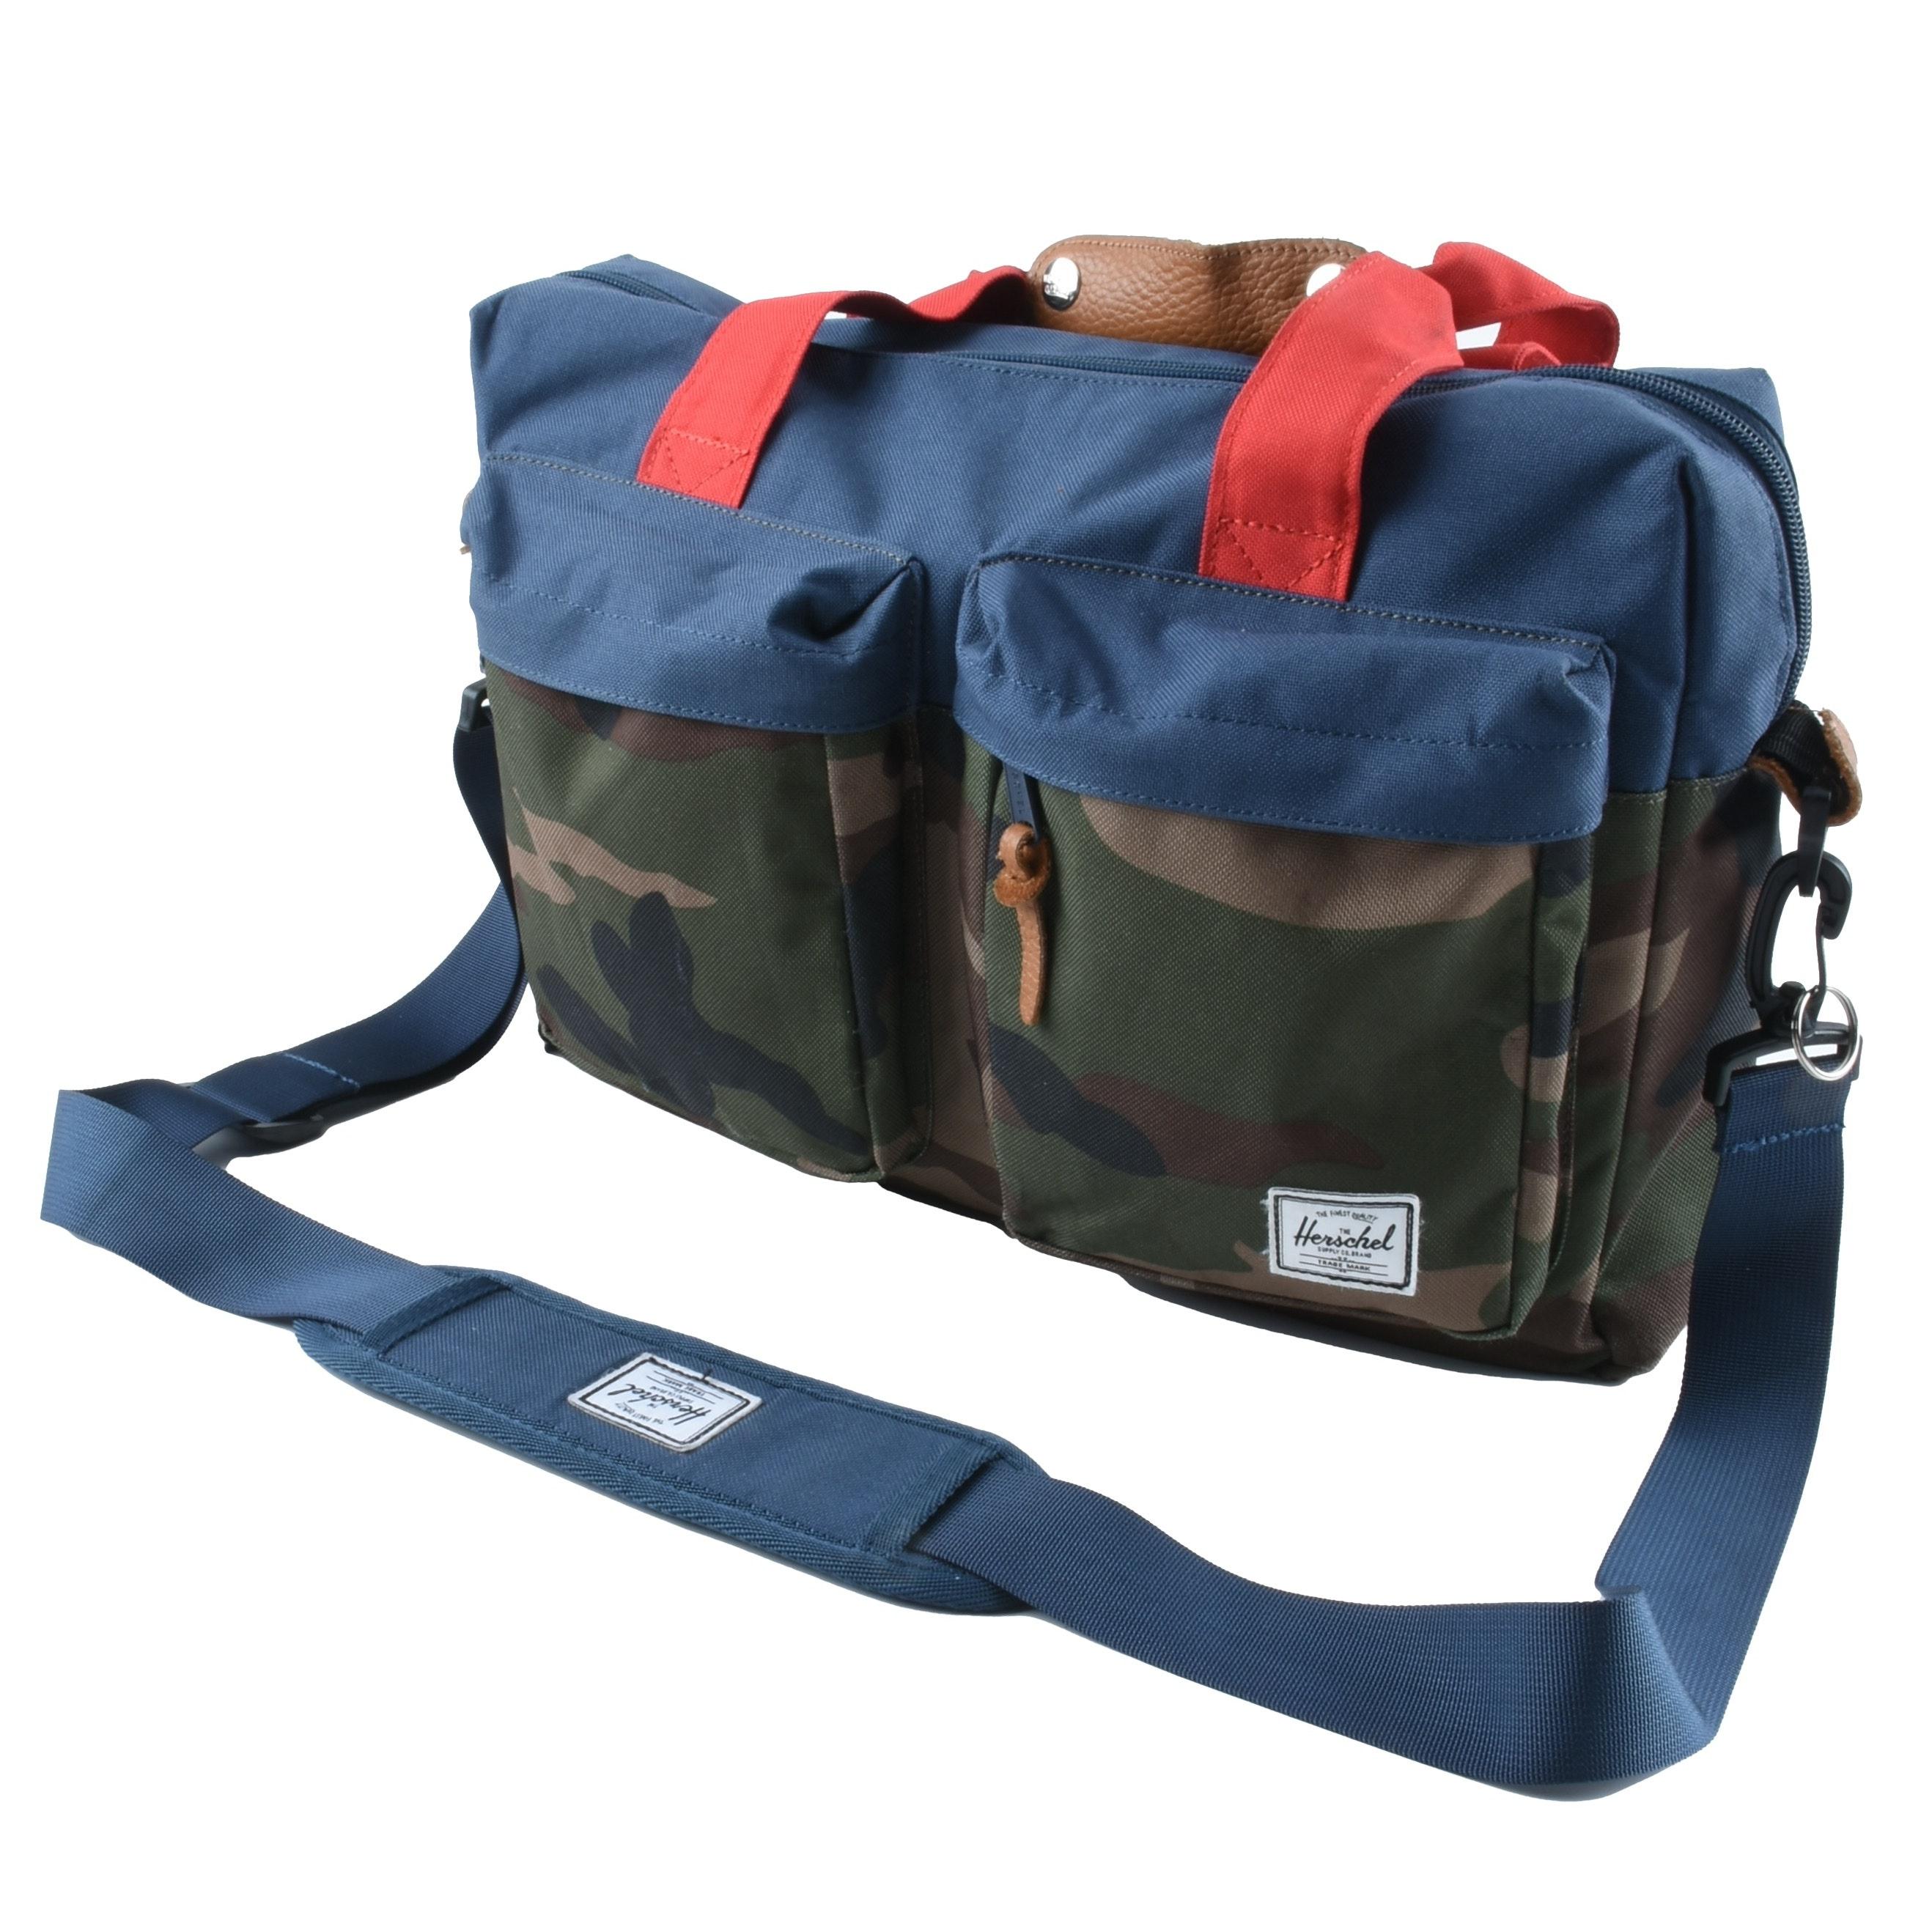 Herschel Totem Camo Messenger Bag